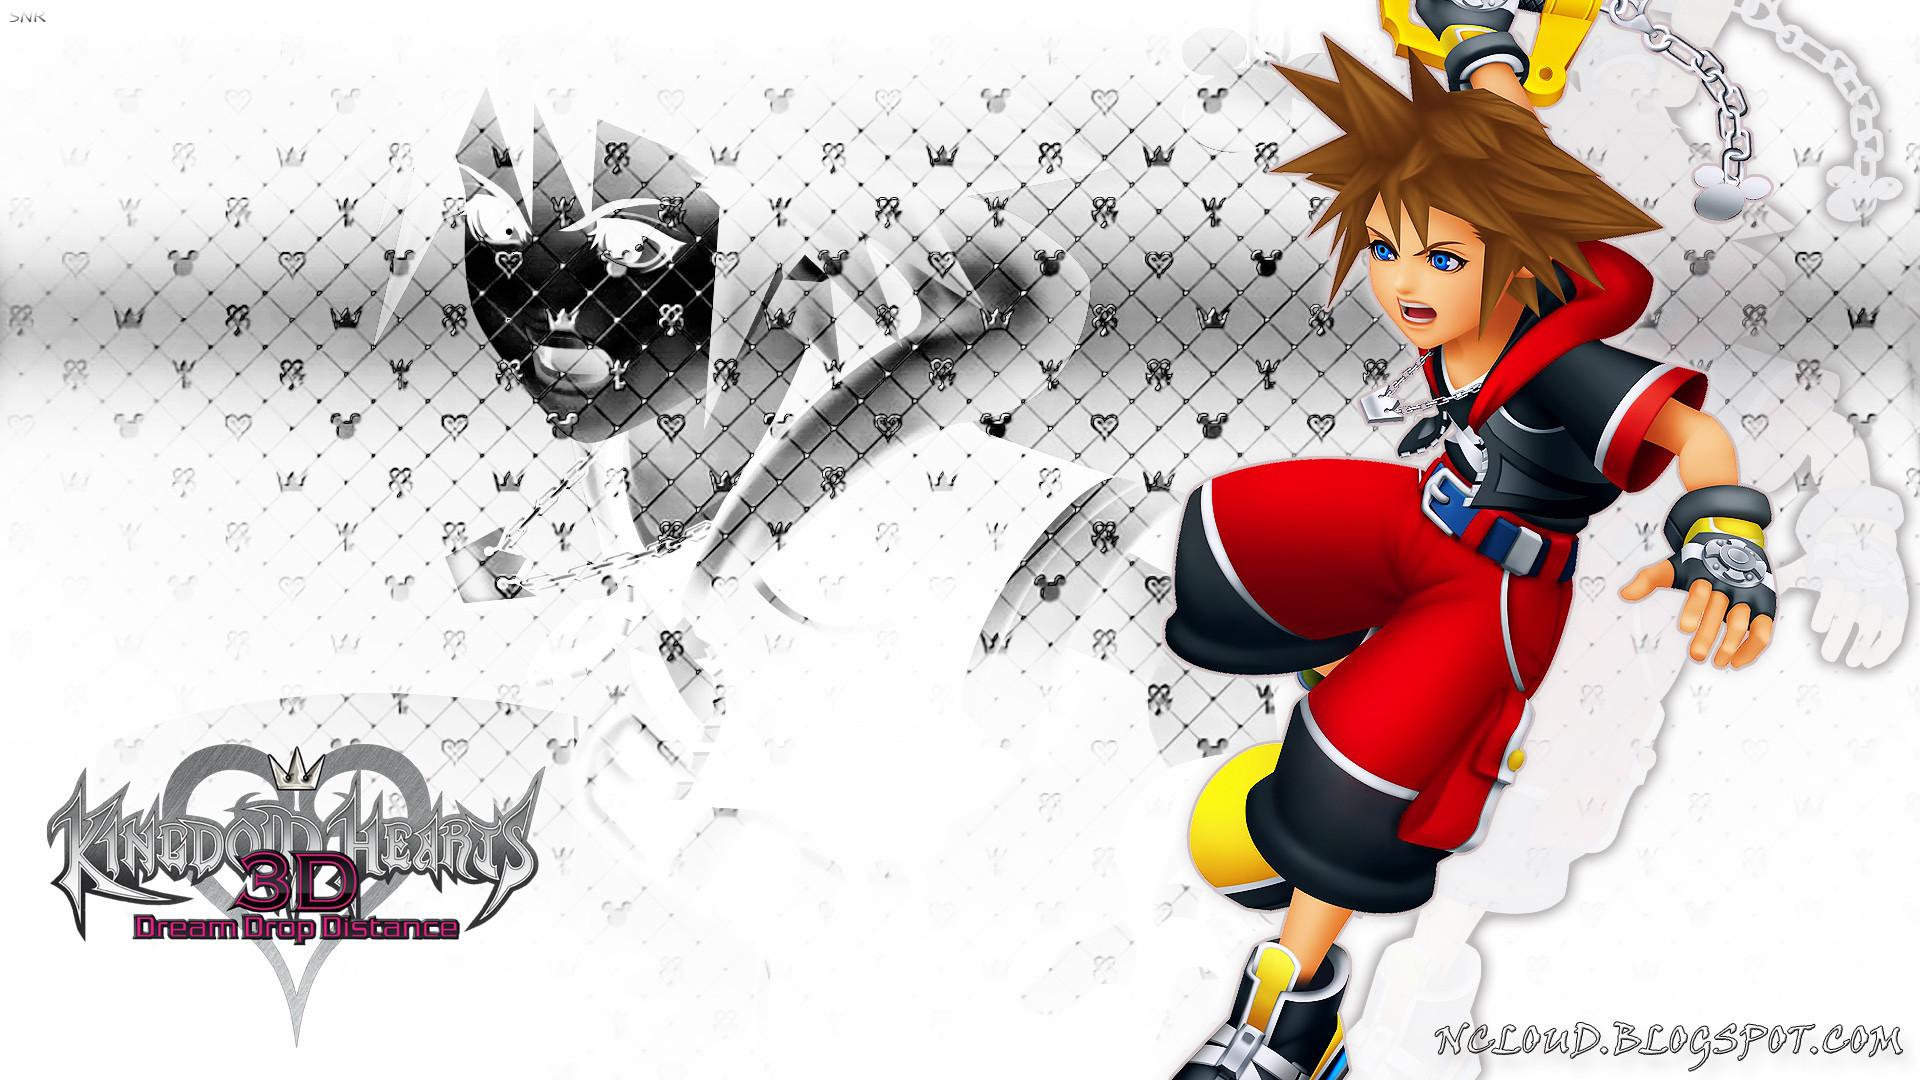 Kingdom Hearts Riku Wallpaper 70 Images